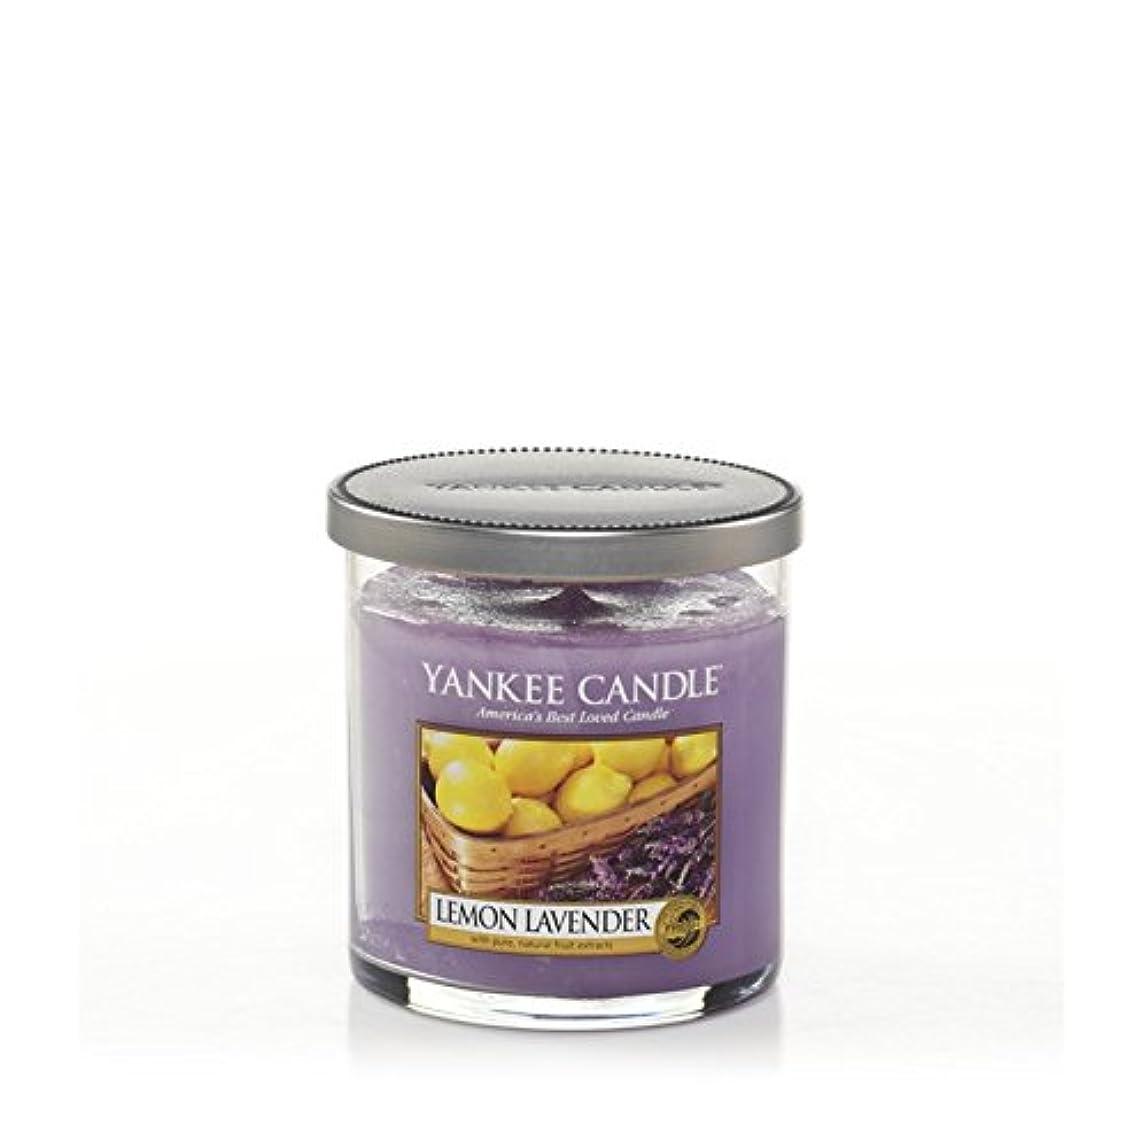 Yankee Candles Small Pillar Candle - Lemon Lavender (Pack of 6) - ヤンキーキャンドルの小さな柱キャンドル - レモンラベンダー (x6) [並行輸入品]